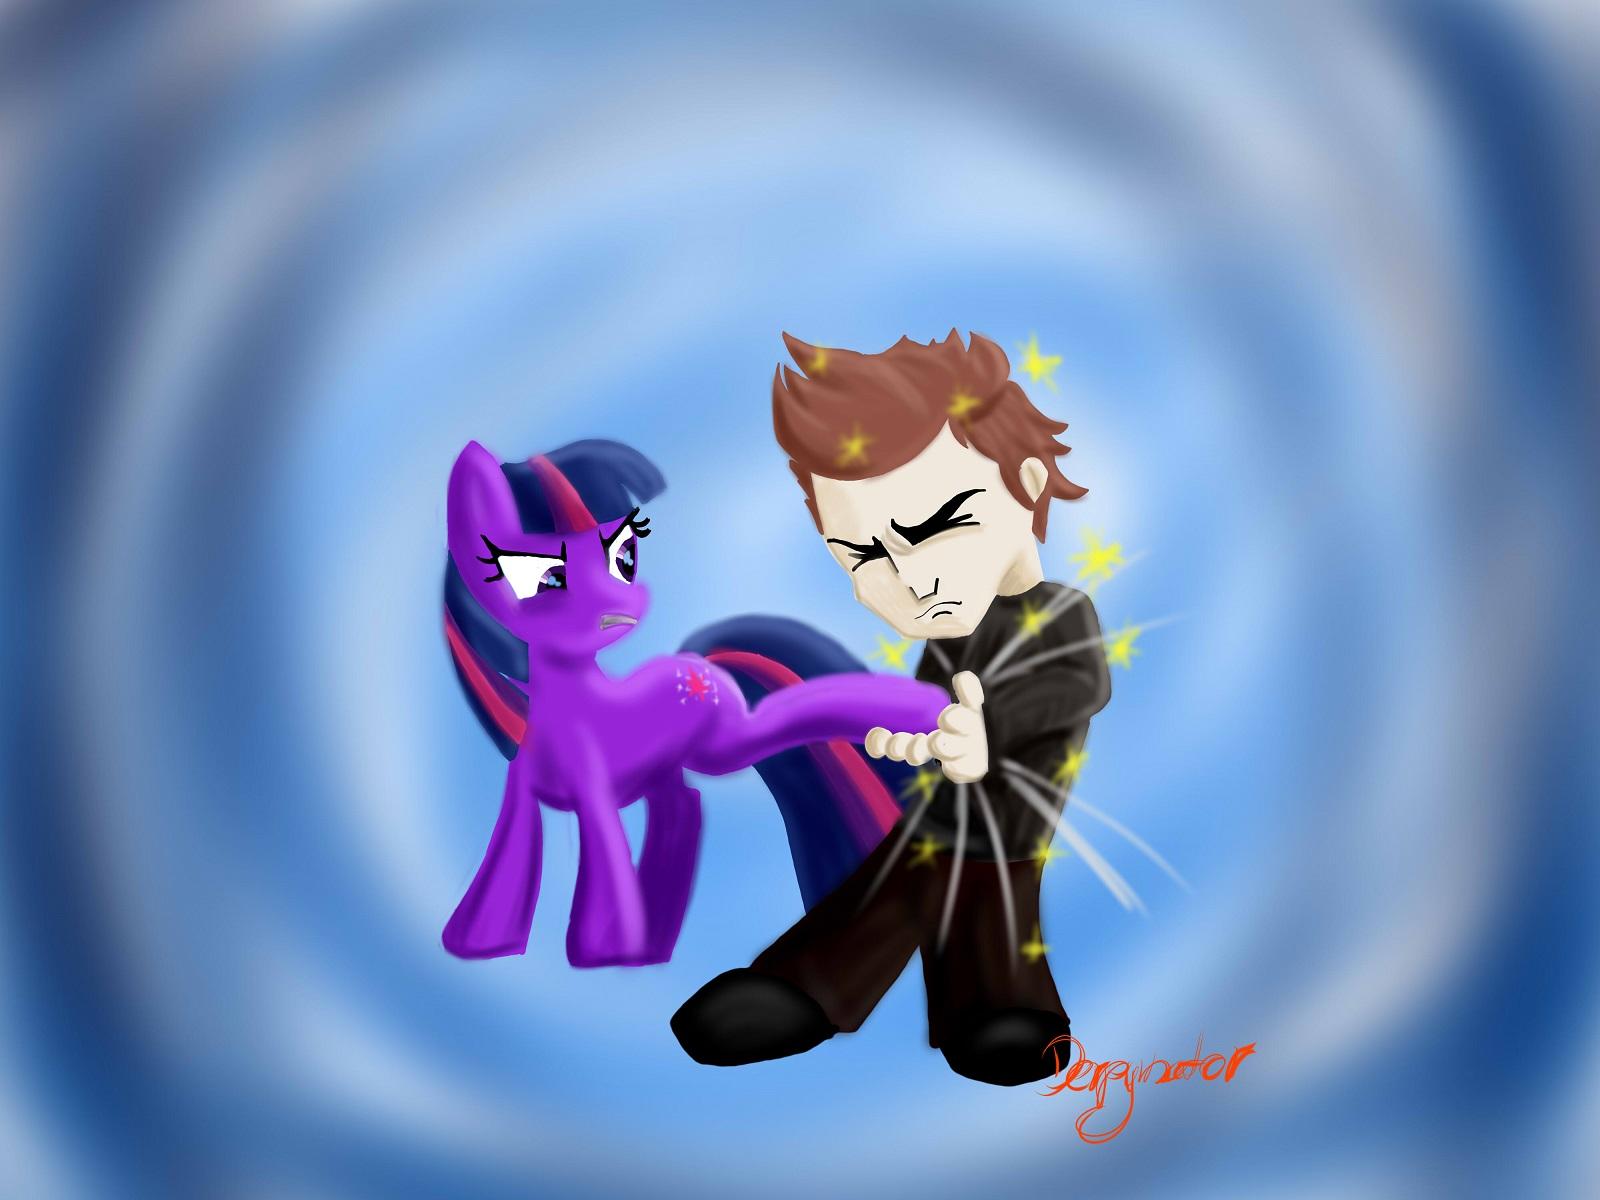 Twilight fought sparkles